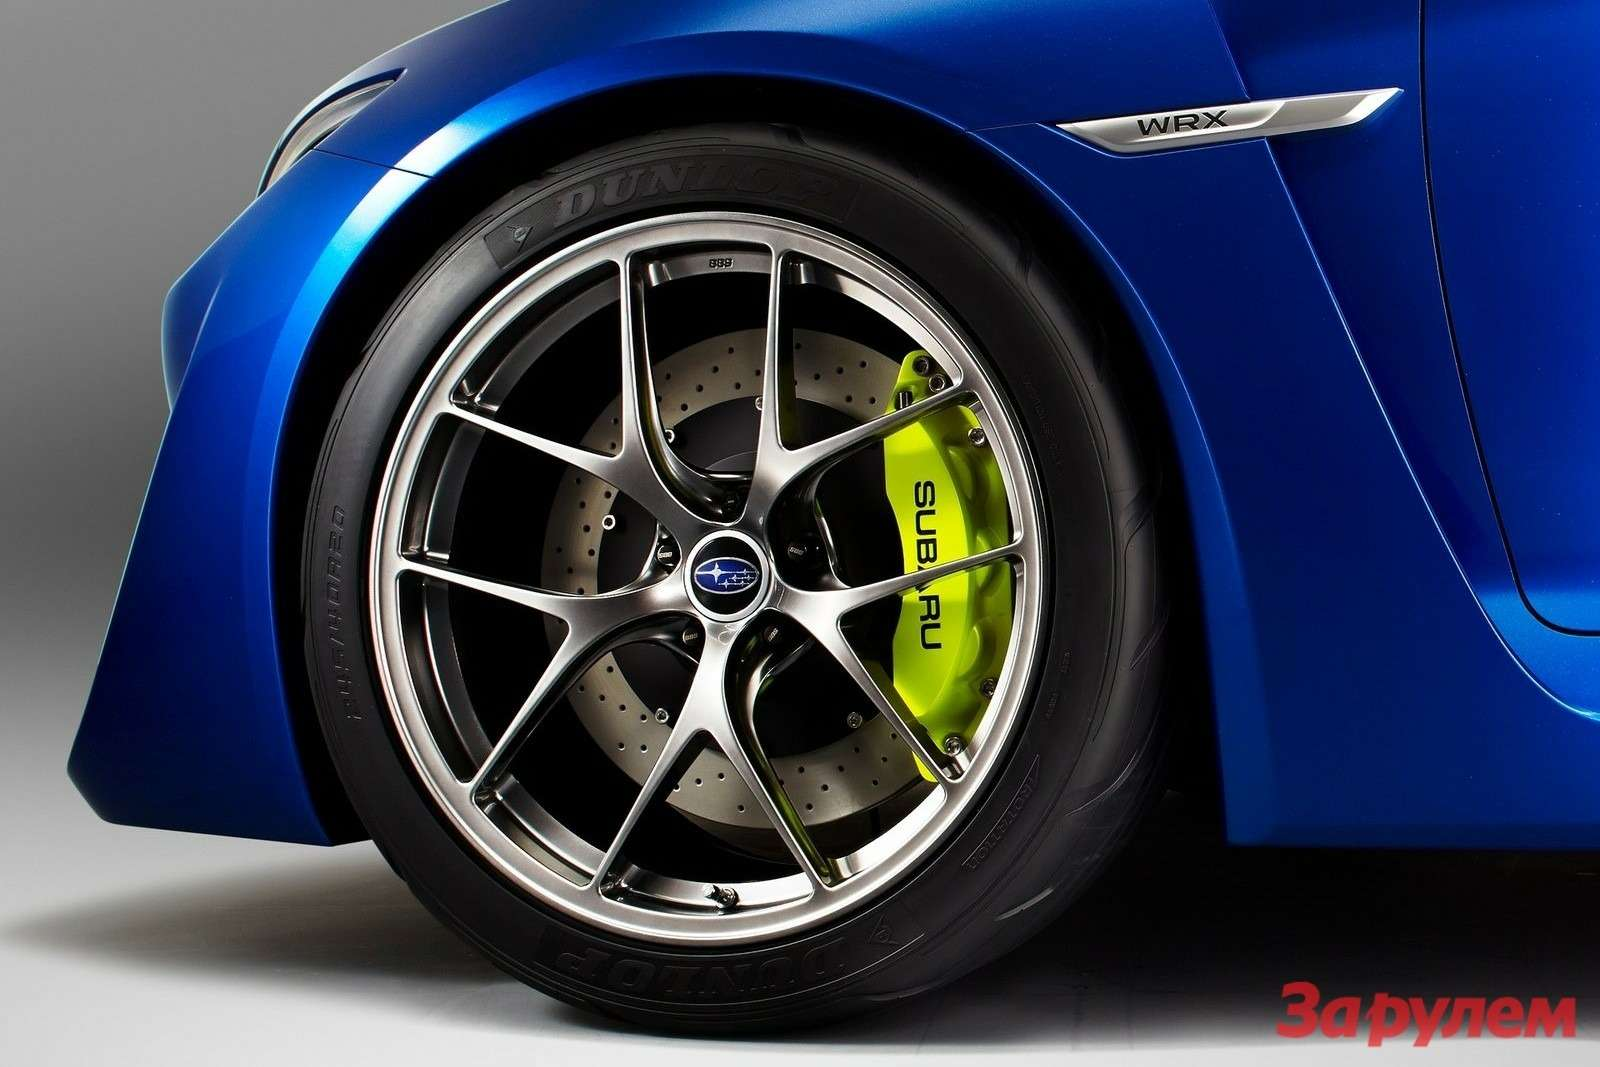 Subaru WRX Concept 2013 1600x1200 wallpaper 0e